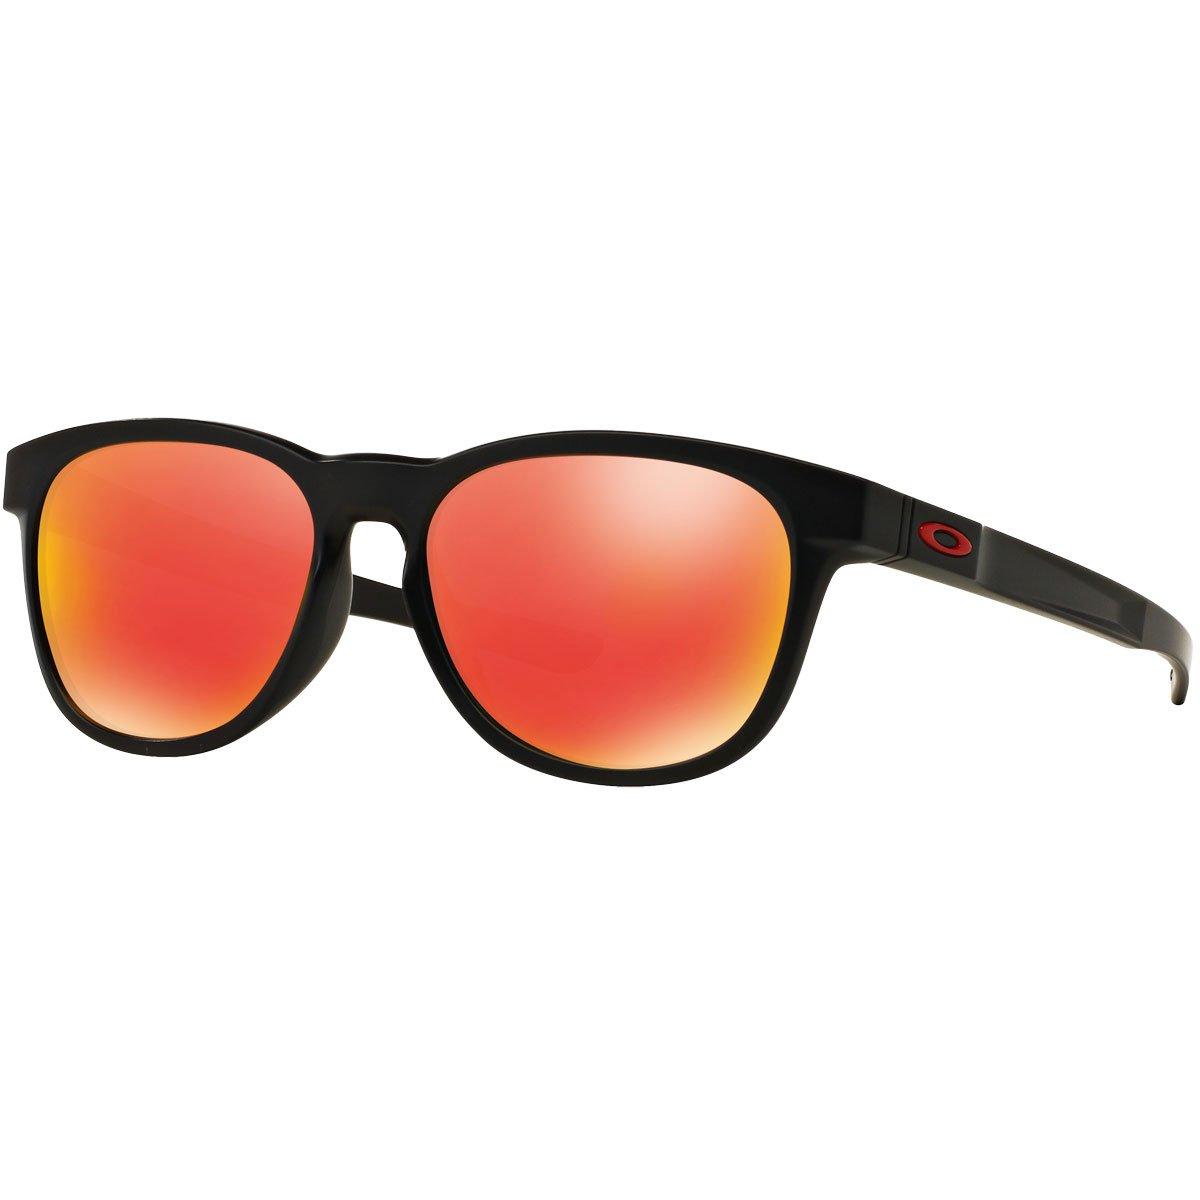 Oakley Men's OO9315 Stringer Rectangular Sunglasses, Matte Black/Ruby Iridium, 55 mm by Oakley